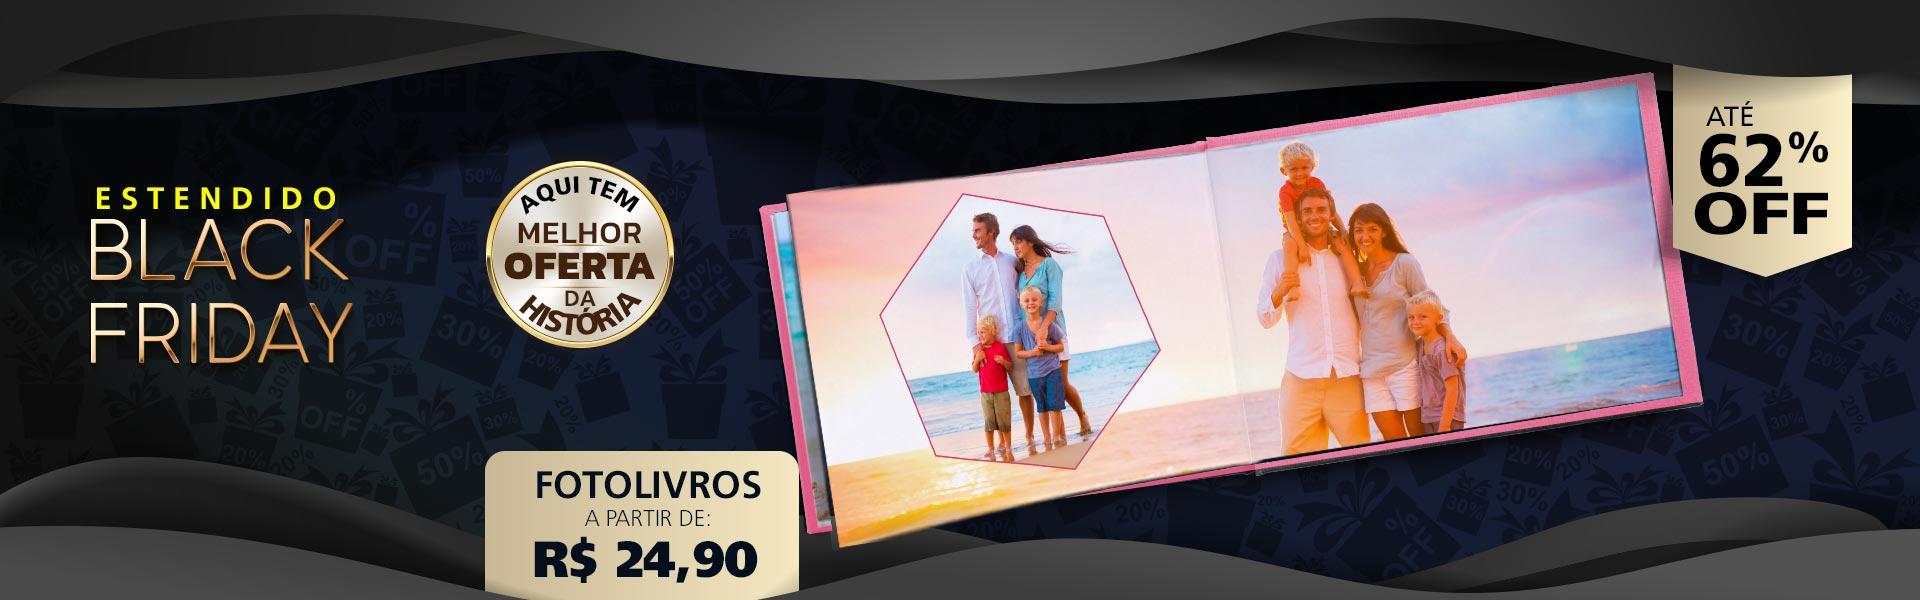 Fotolivro - Phooto Brasil